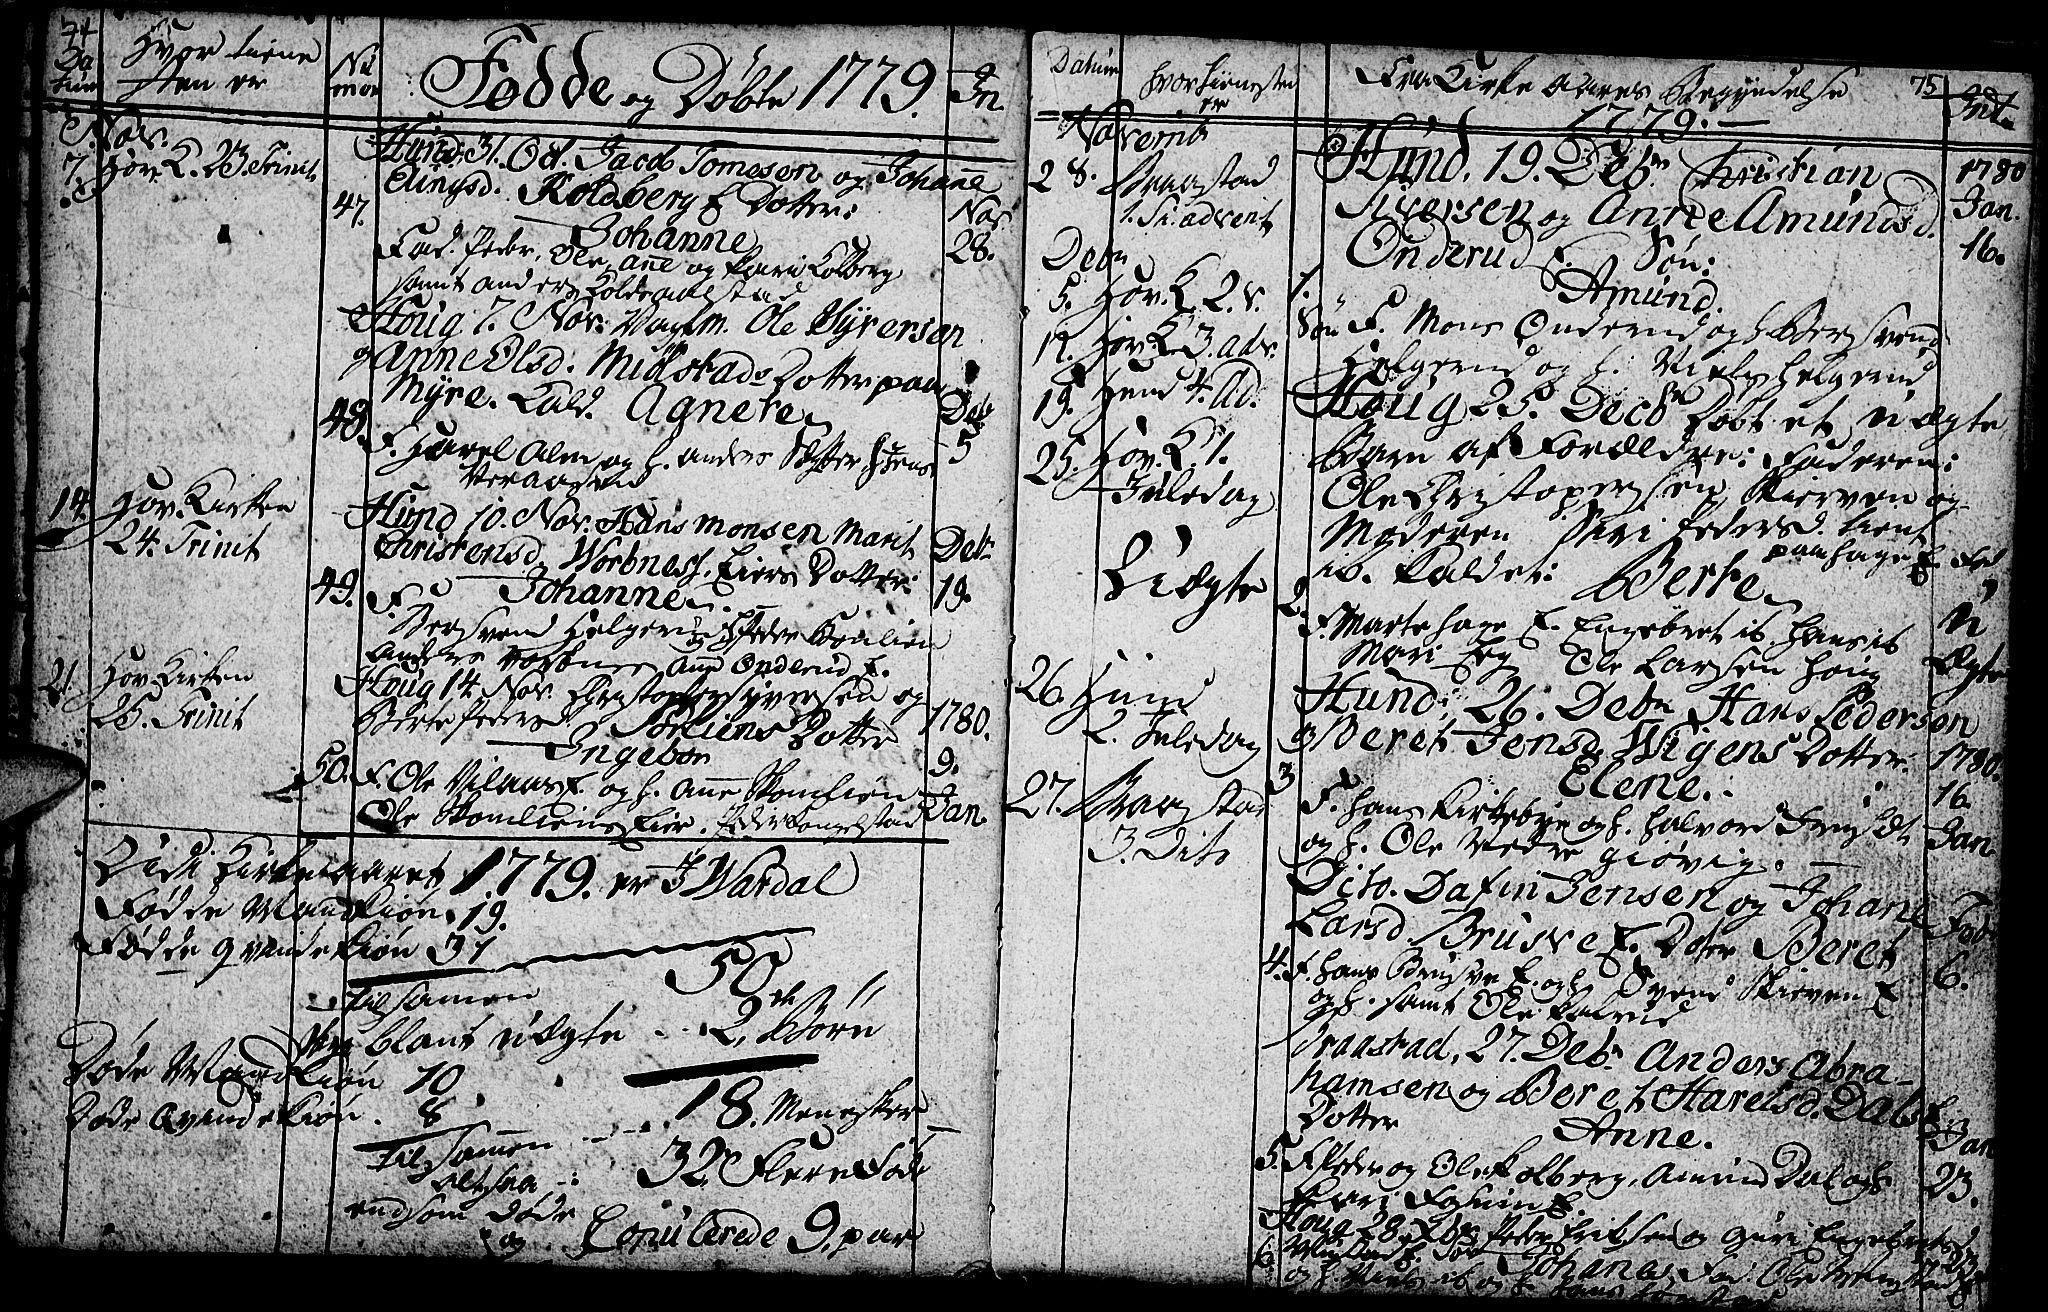 SAH, Vardal prestekontor, H/Ha/Hab/L0001: Klokkerbok nr. 1, 1771-1790, s. 74-75